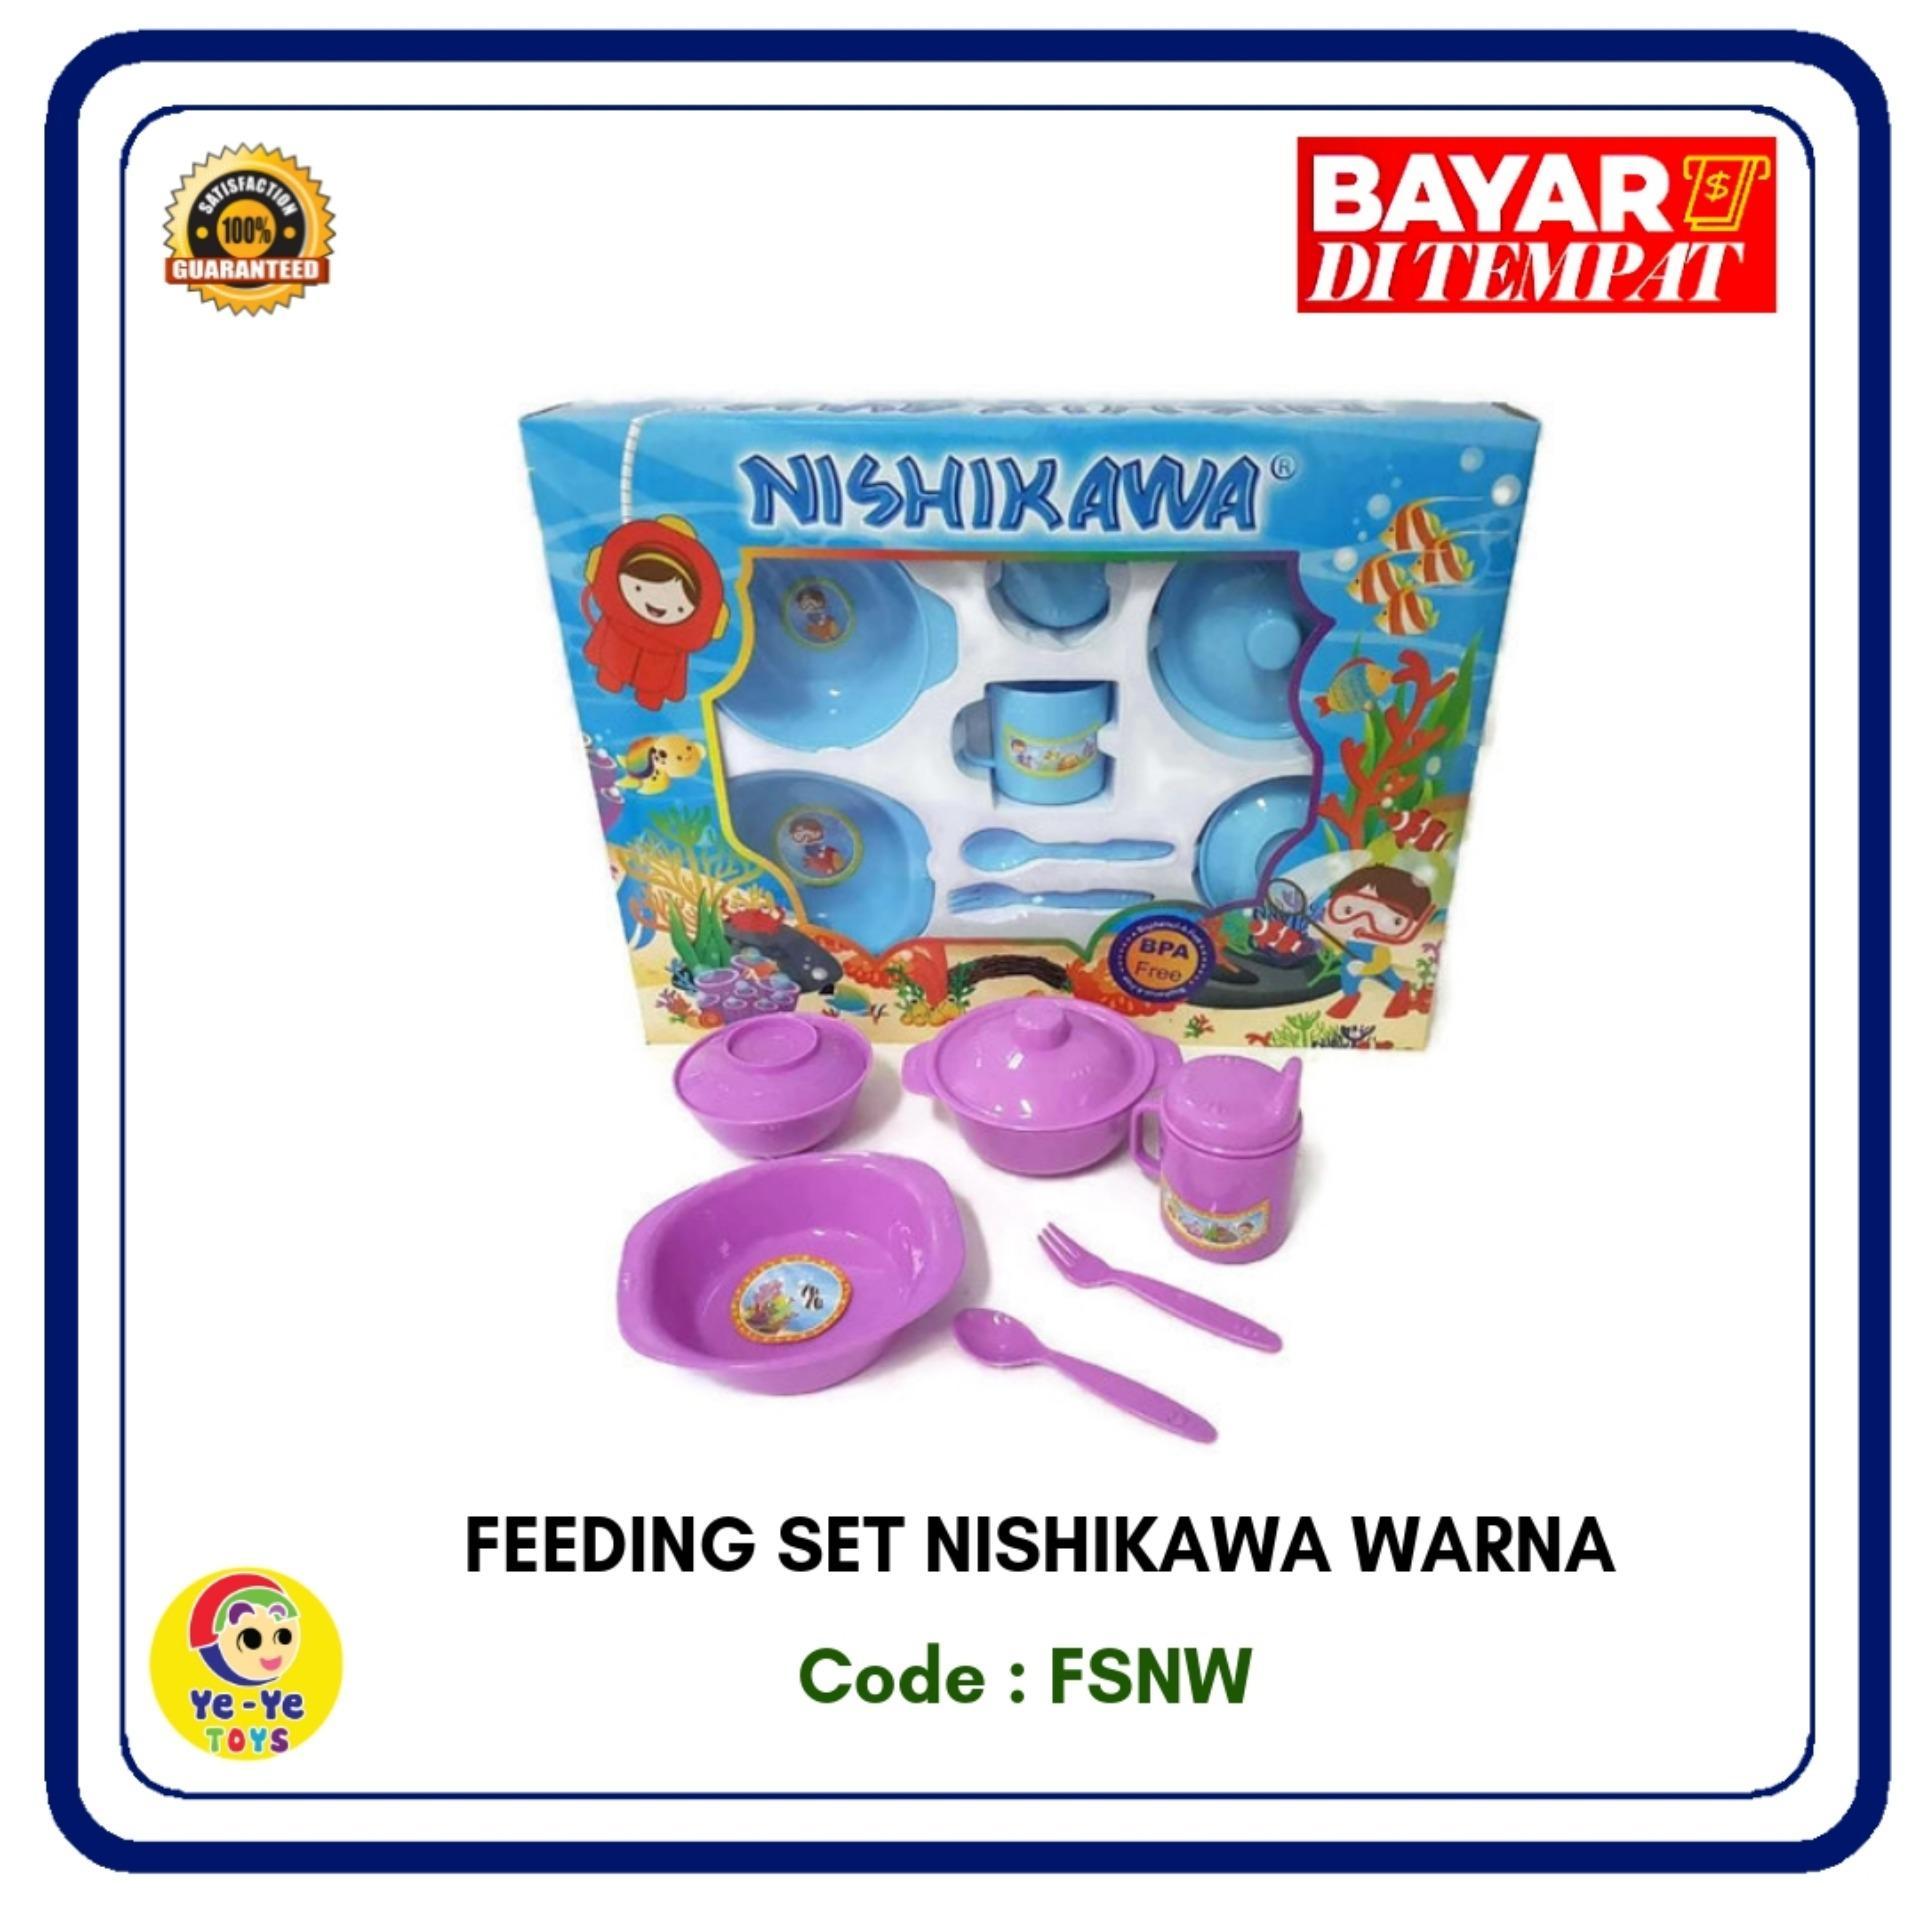 ing set / tempat makan bayi / peralatan makan bayi / ing set nishikawa warna